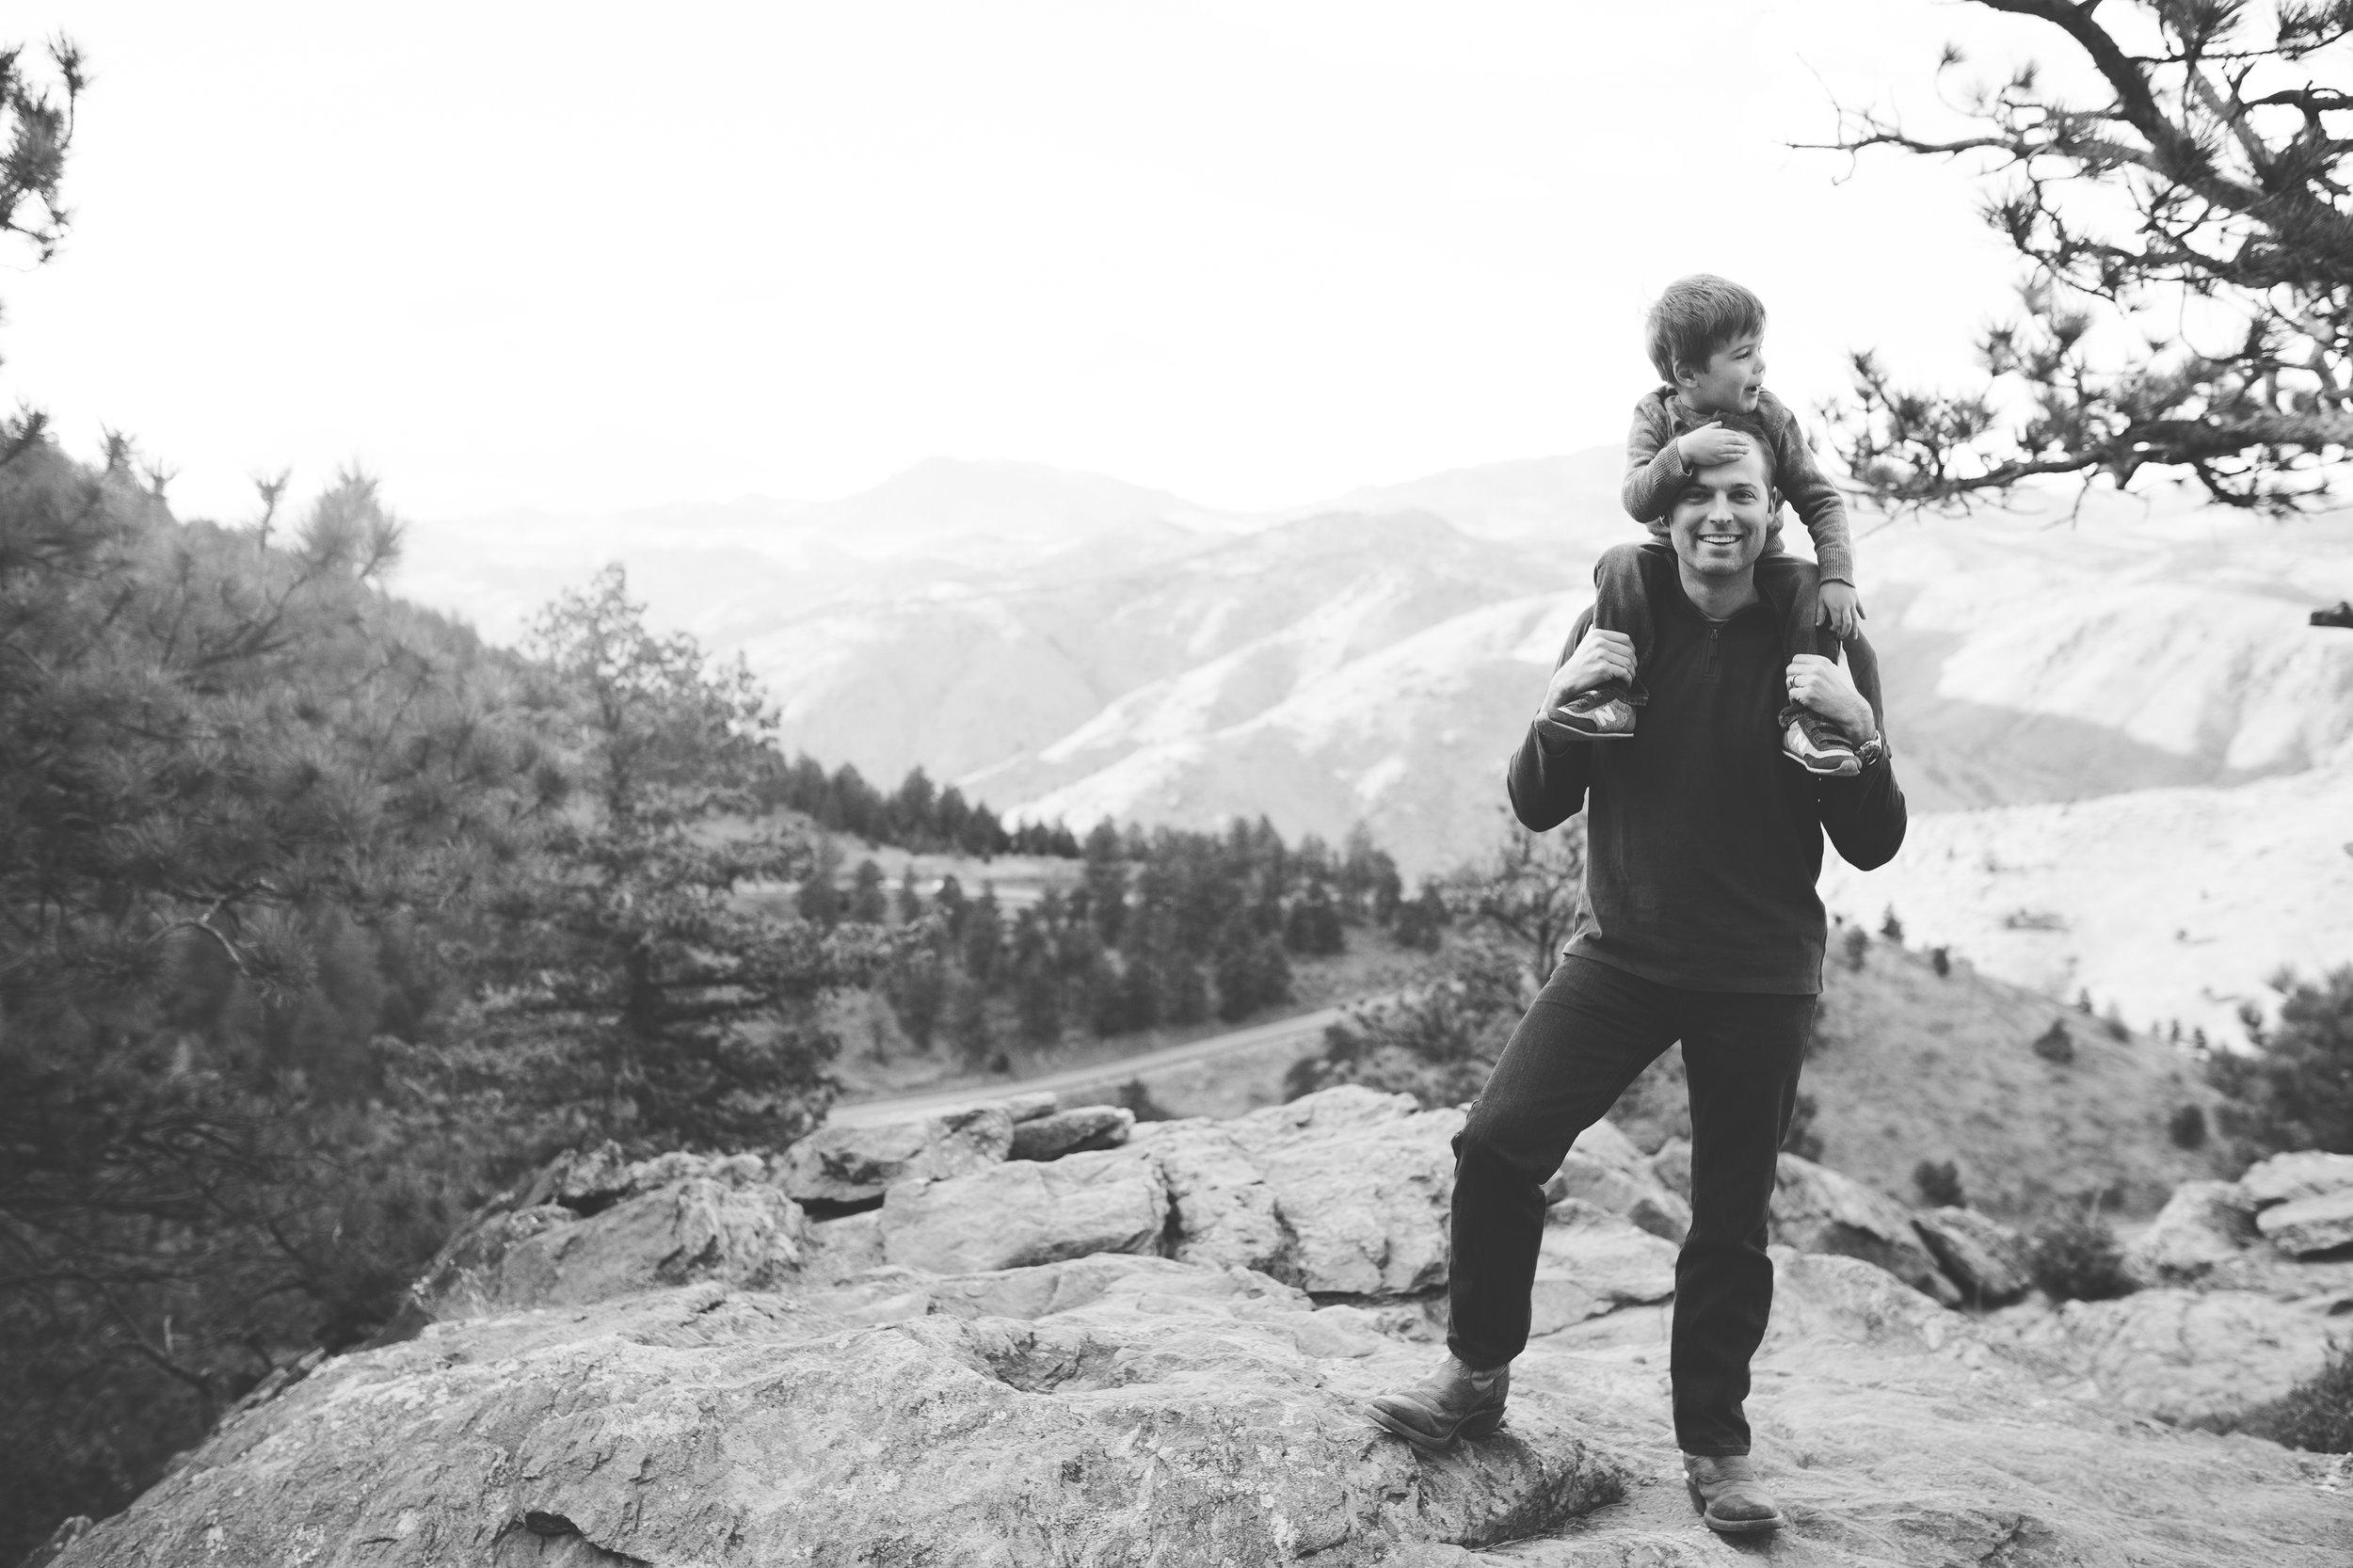 WalkerFamily-Fall'18-39.jpg